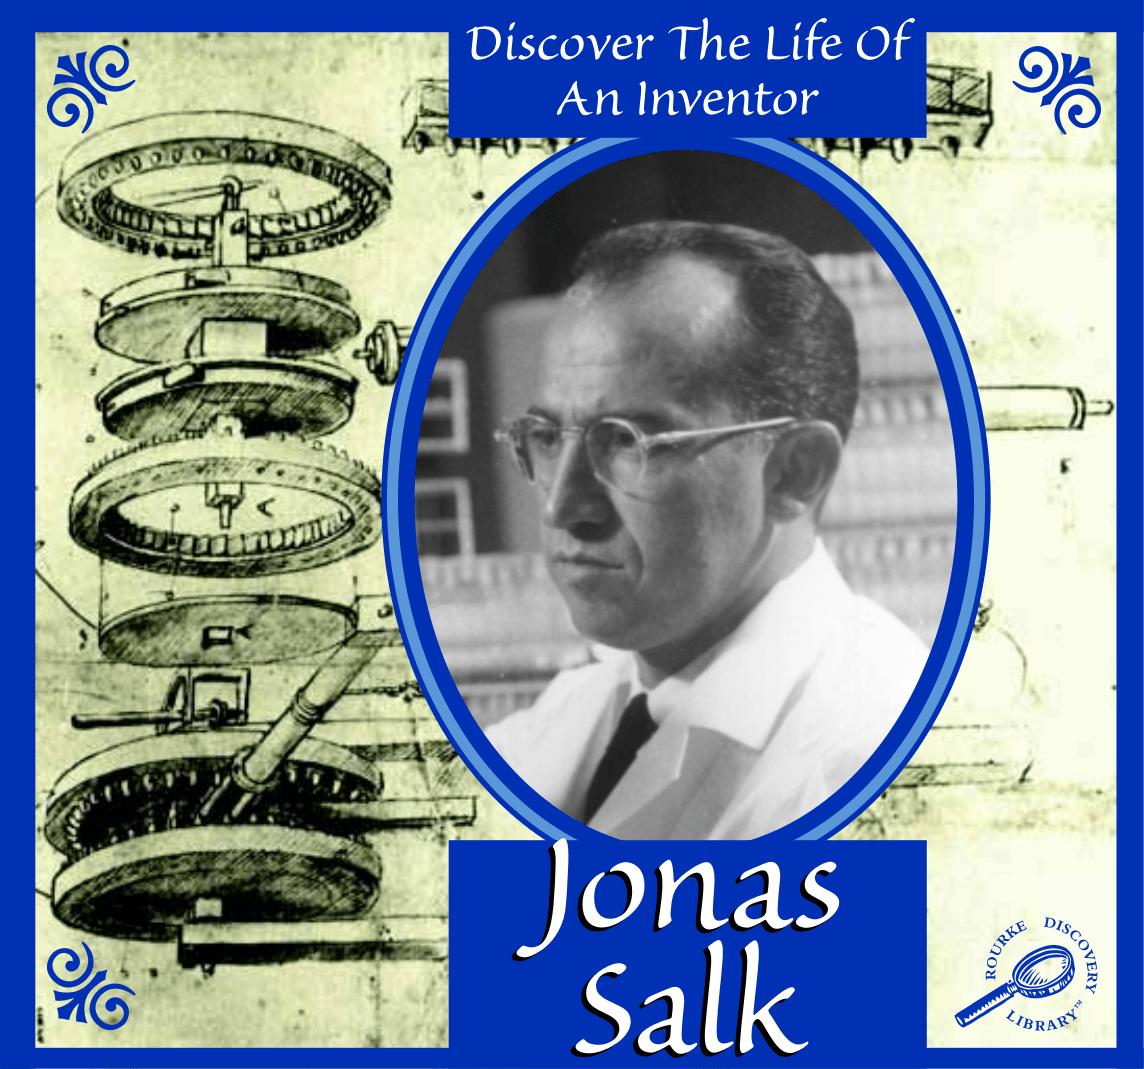 the life and contributions of jonas salk